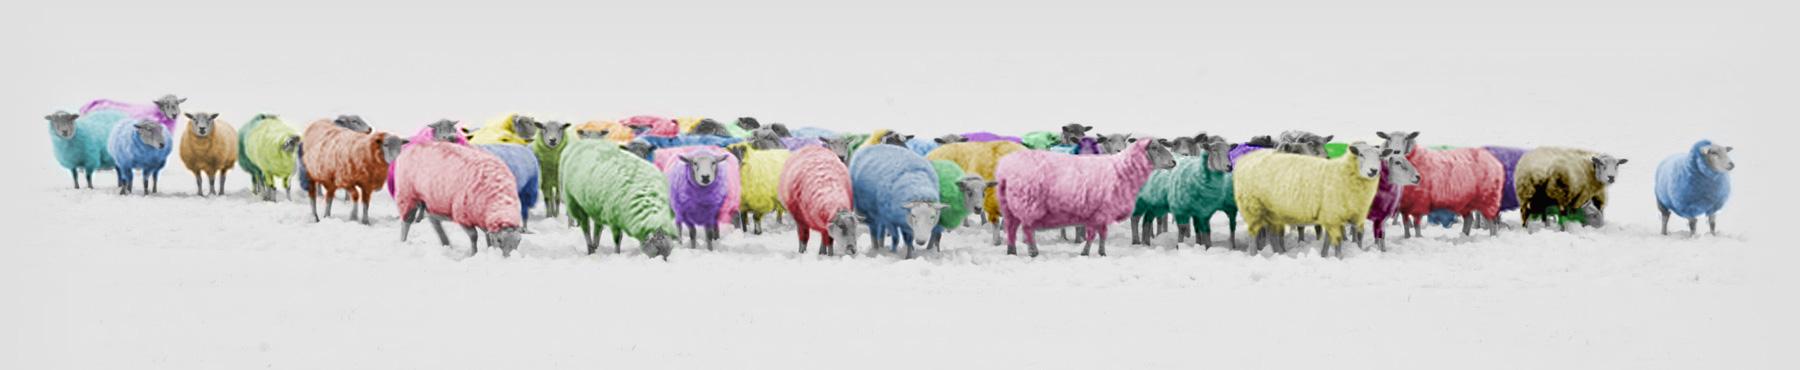 Pantone Sheep